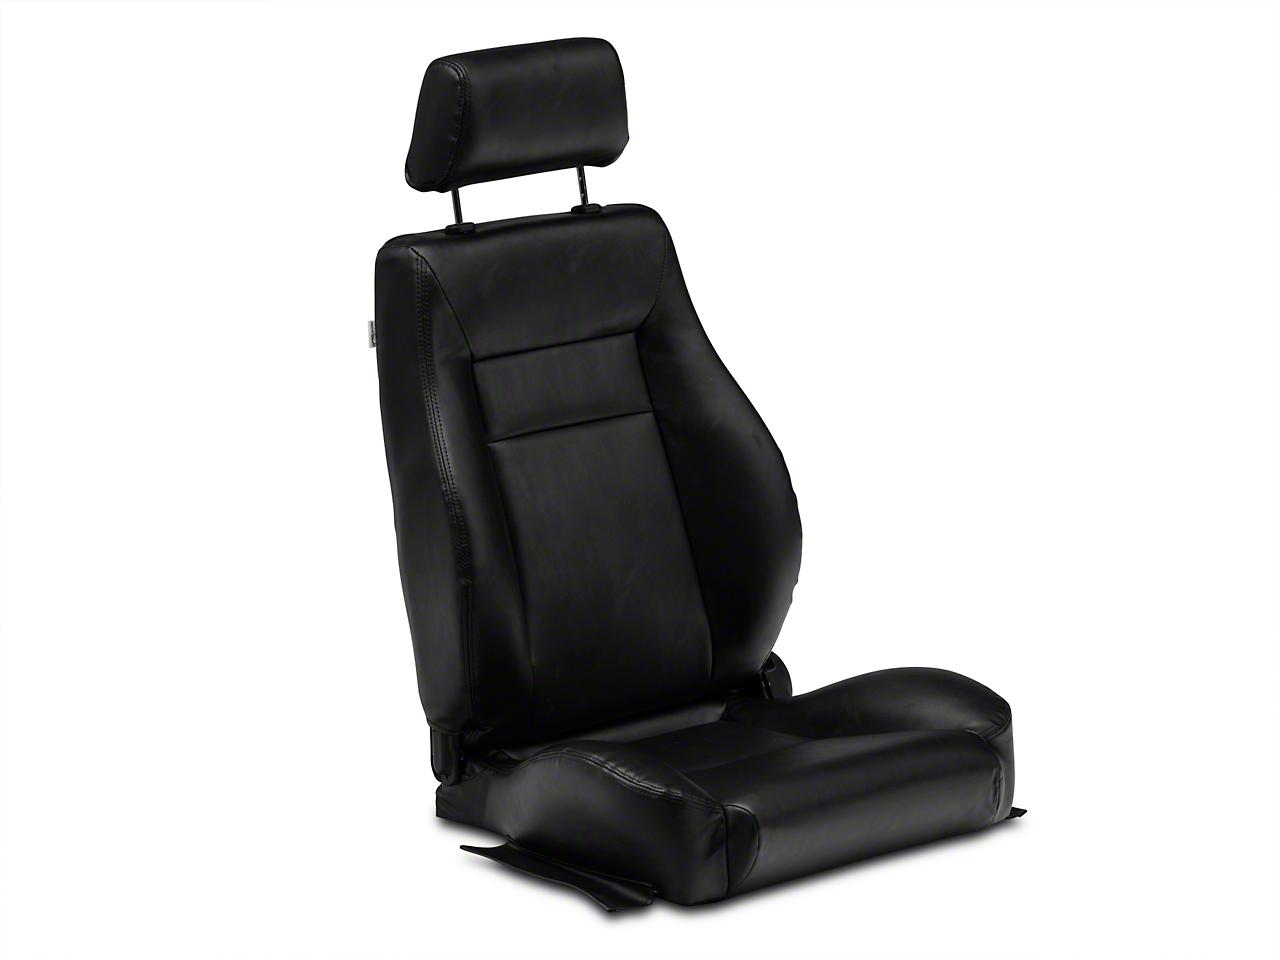 Procar Elite Black Vinyl Reclining Seat - Driver Side (79-14 All)